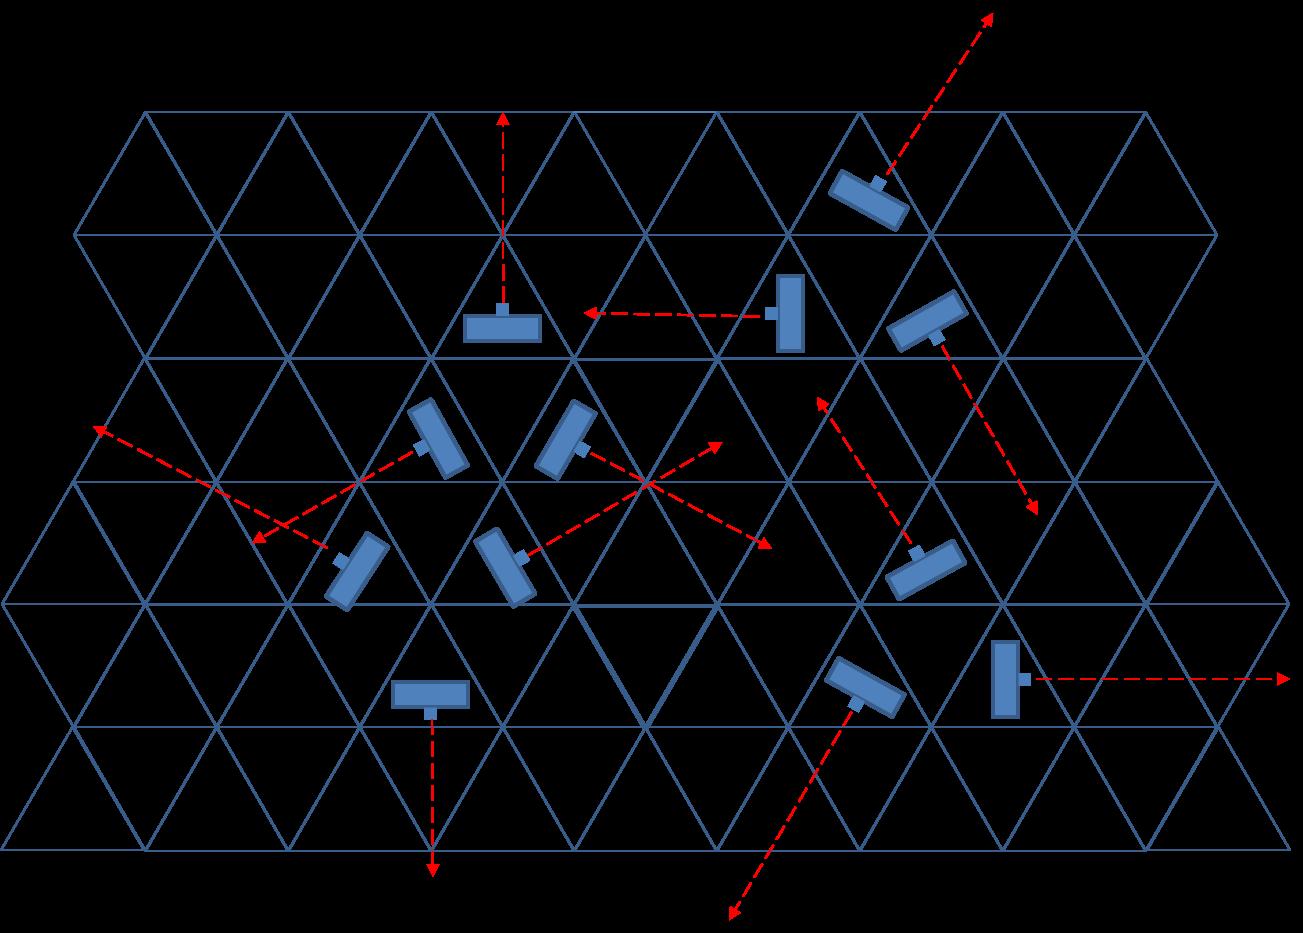 Wargaming Mechanics: Triangular Grids